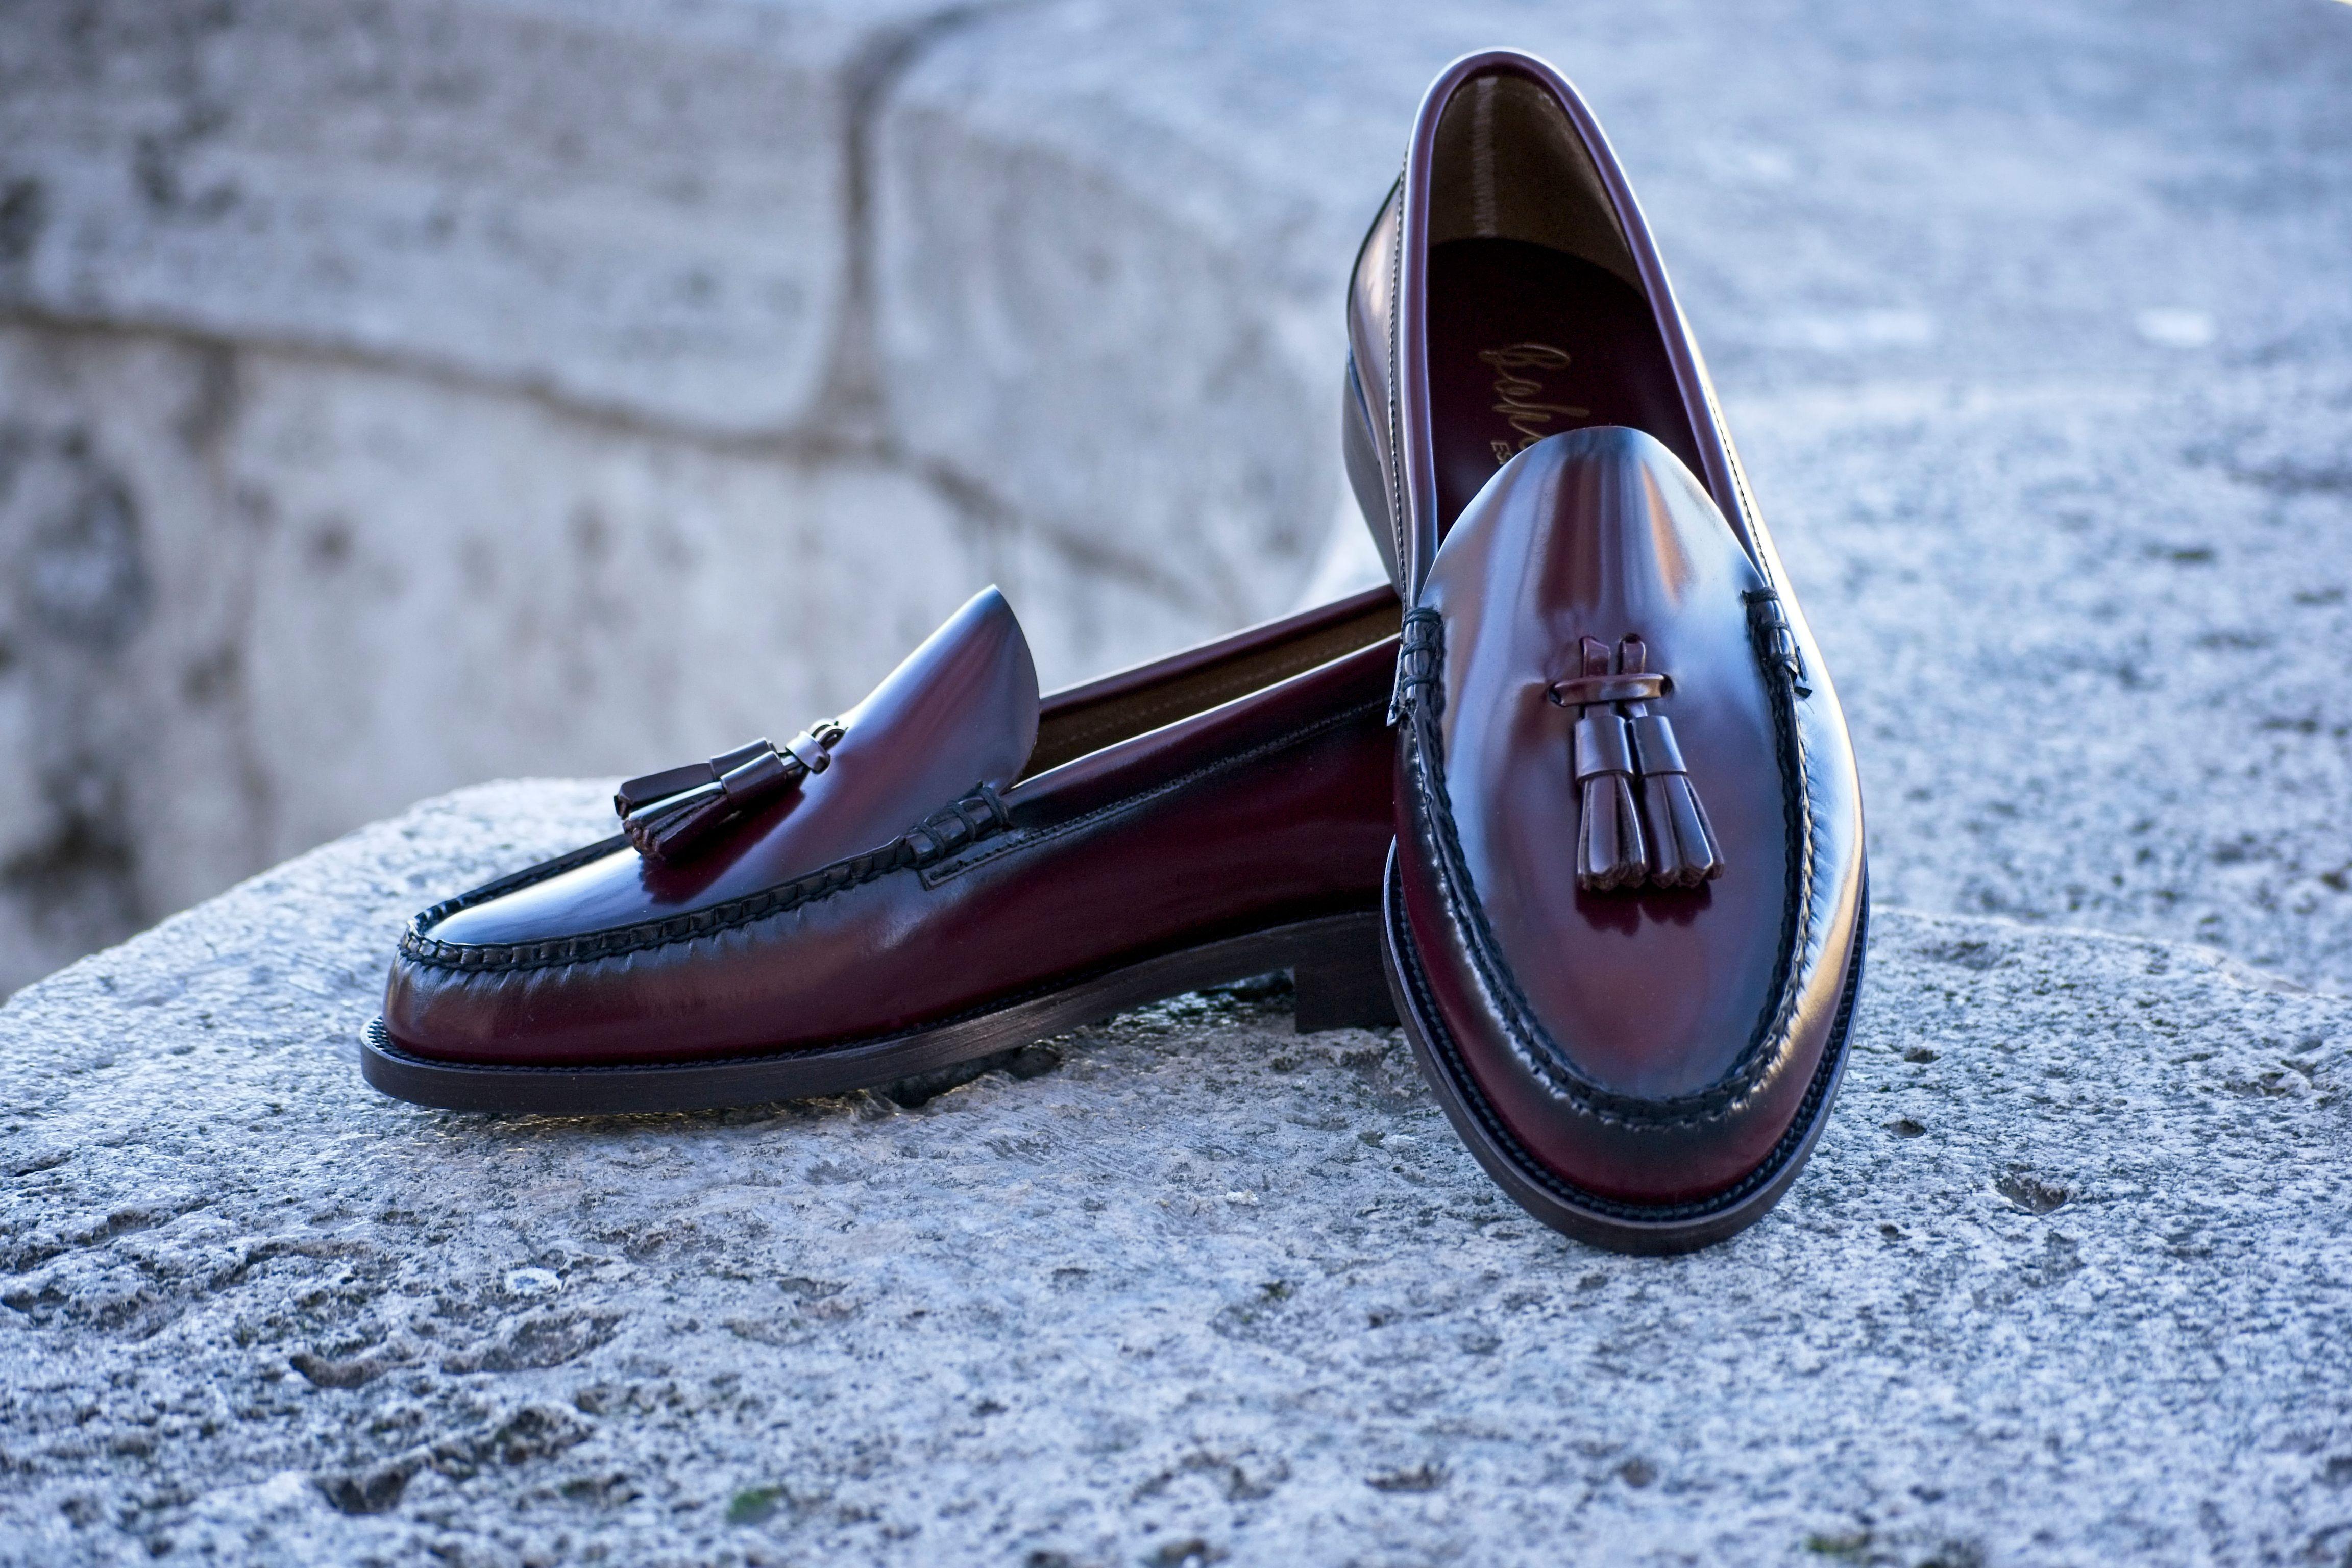 Tassel Loafer modero Ebro de Bohemian Shoes